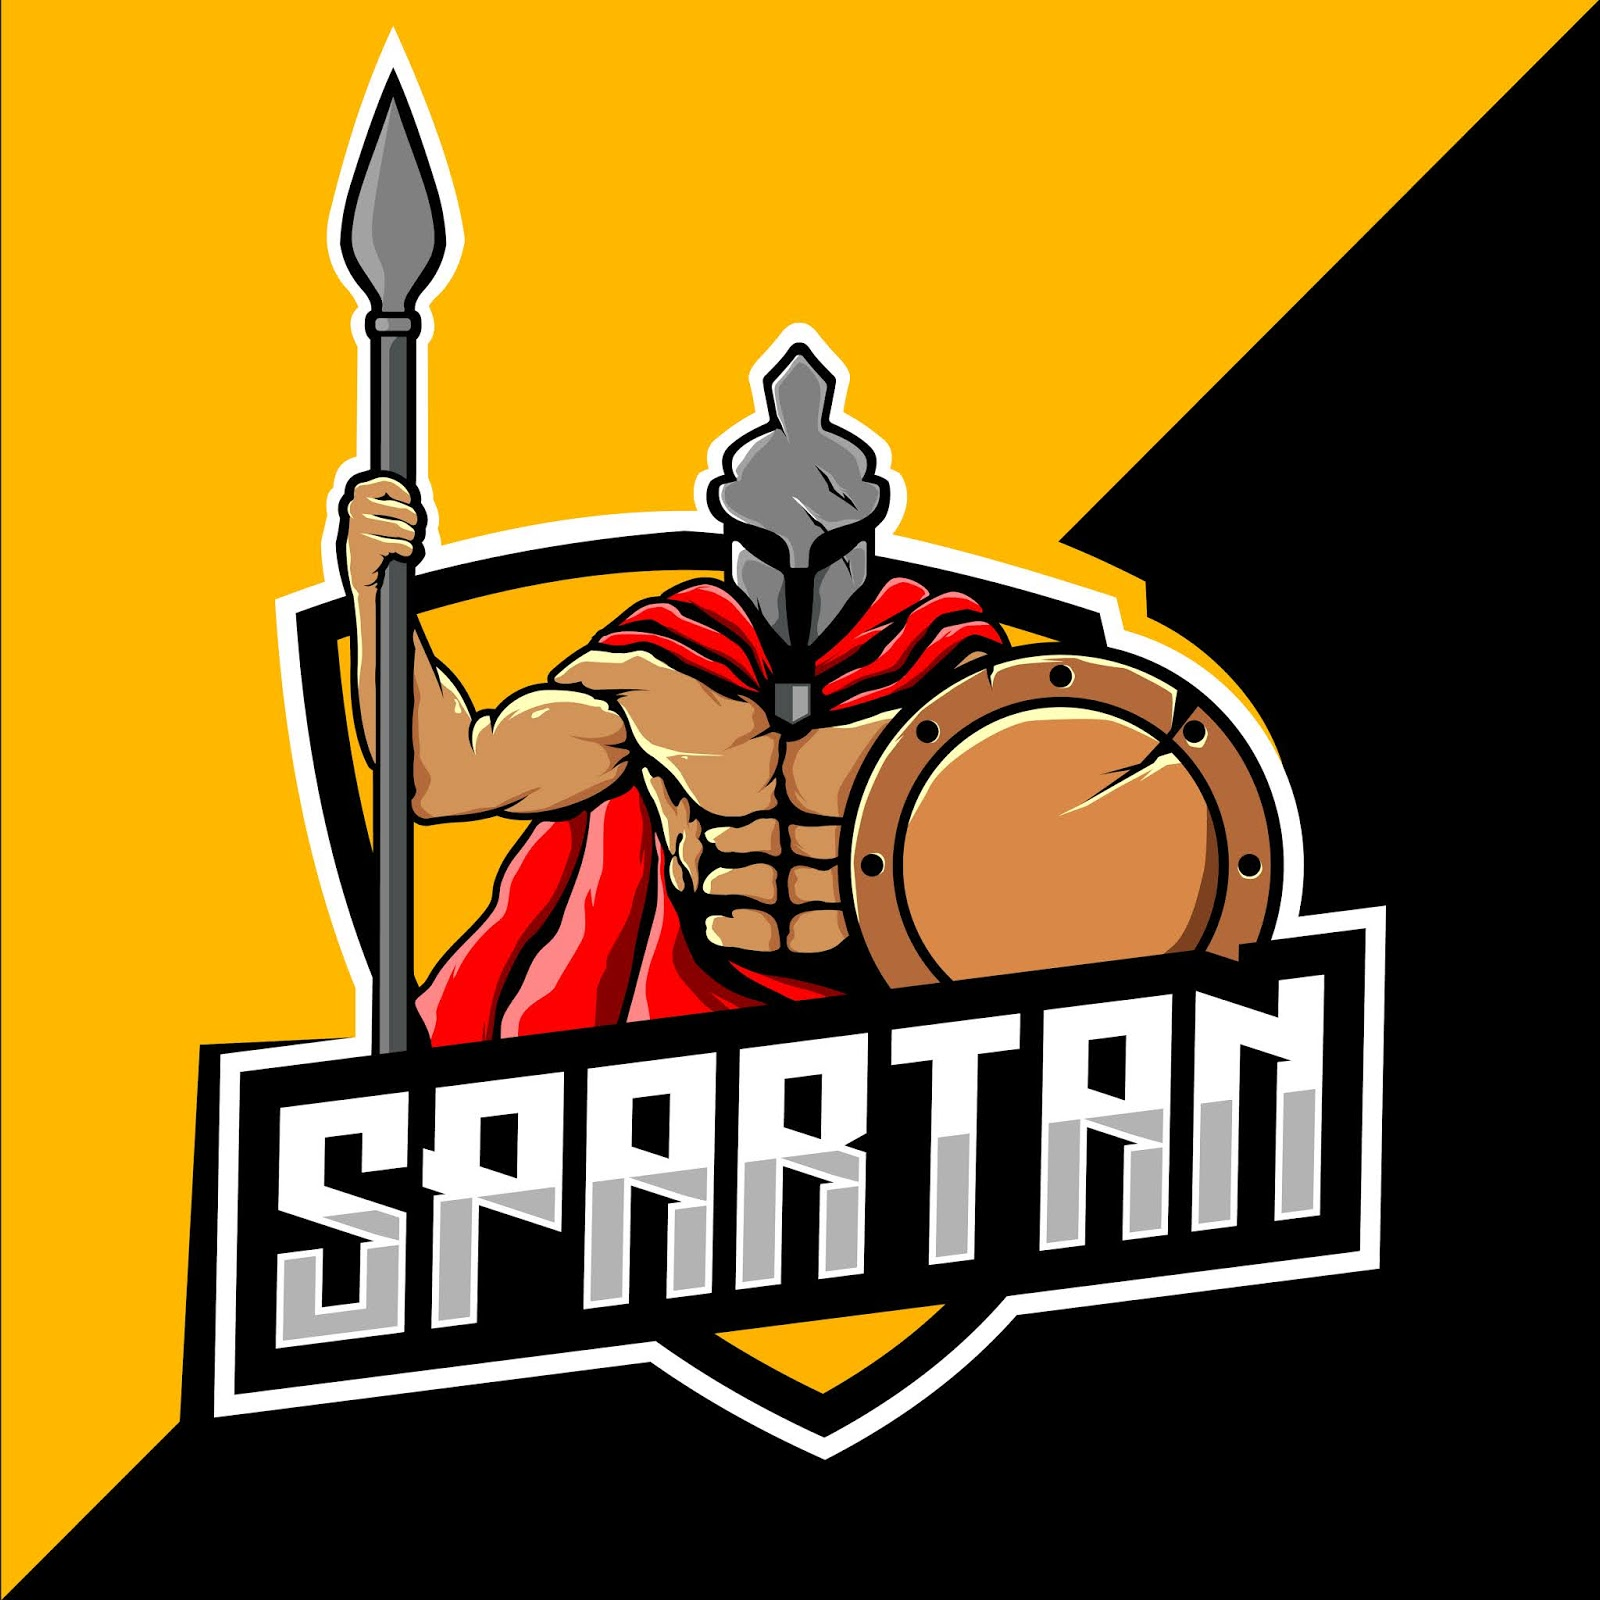 Spartan Warrior Mascot Esport Logo Free Download Vector CDR, AI, EPS and PNG Formats